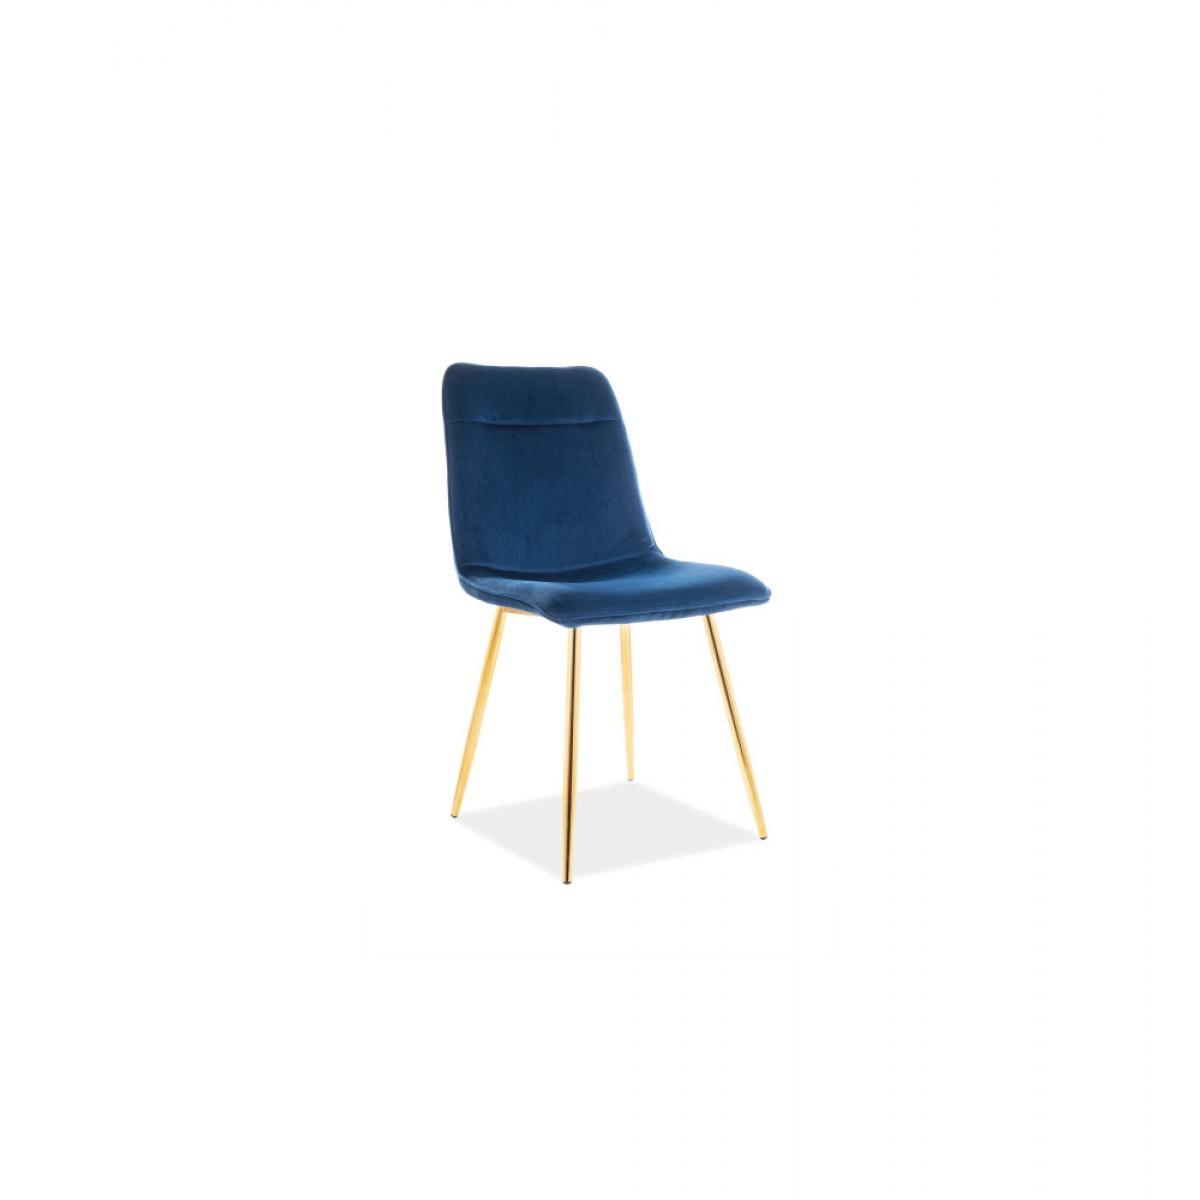 Ac-Deco Chaise Eros - L 47 x l 47 x H 87 cm - Bleu